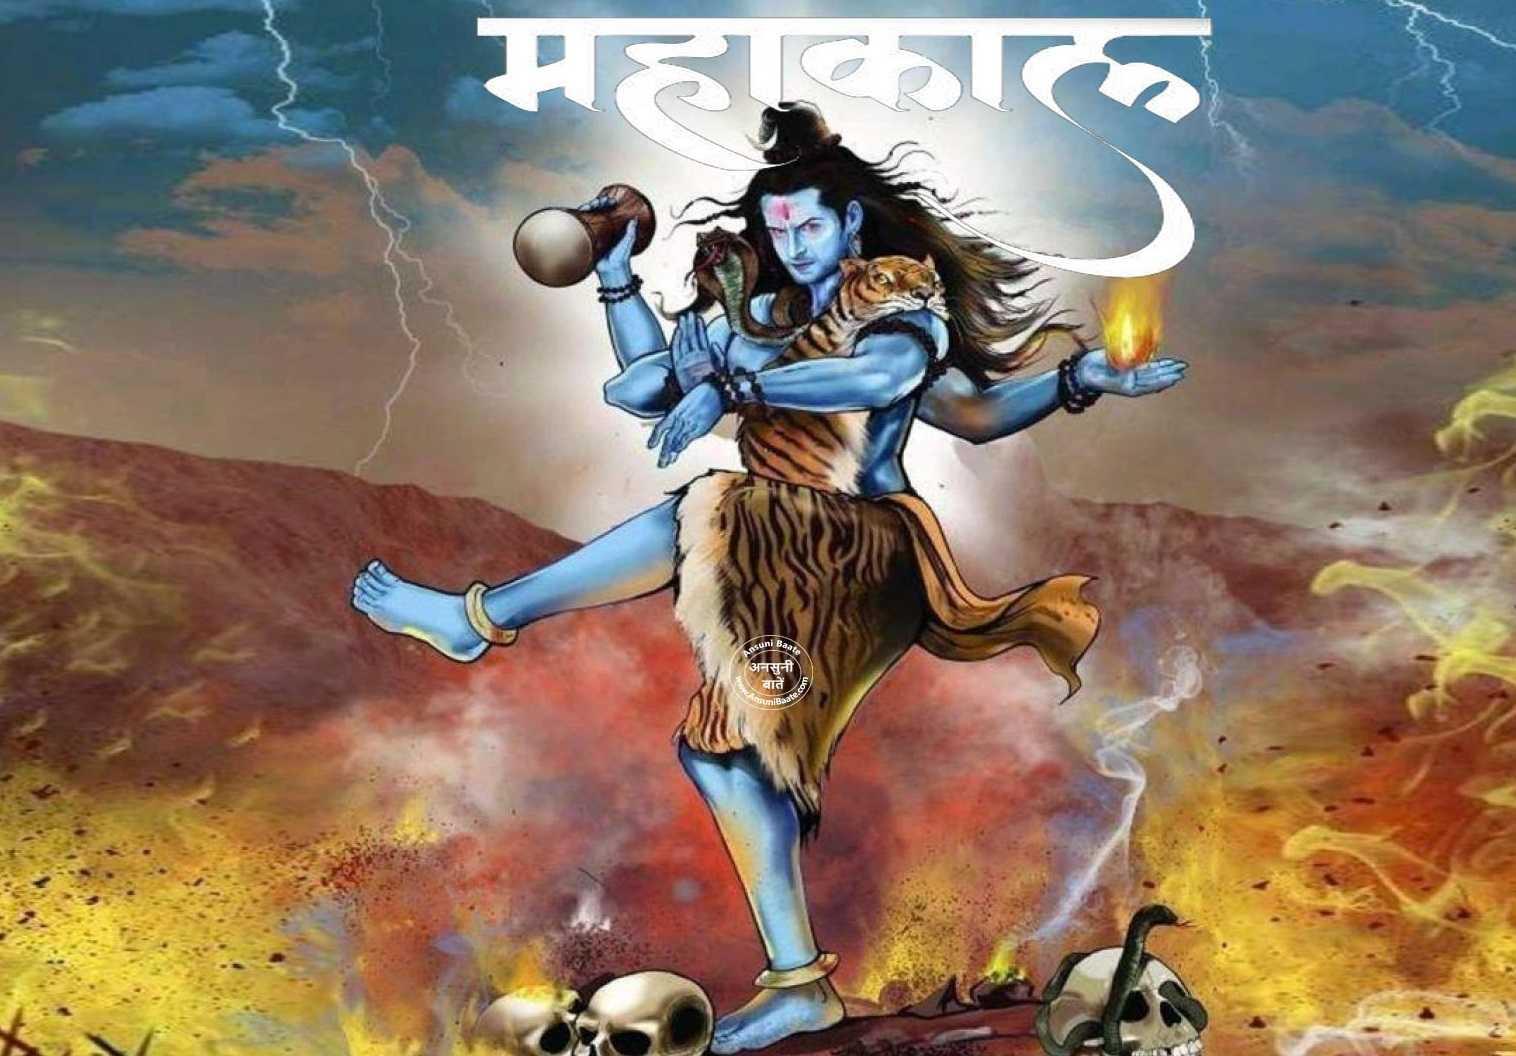 God Mahakal Wallpaper Hd 1080p Download - God Mahakal Wallpaper Hd 1080p Download